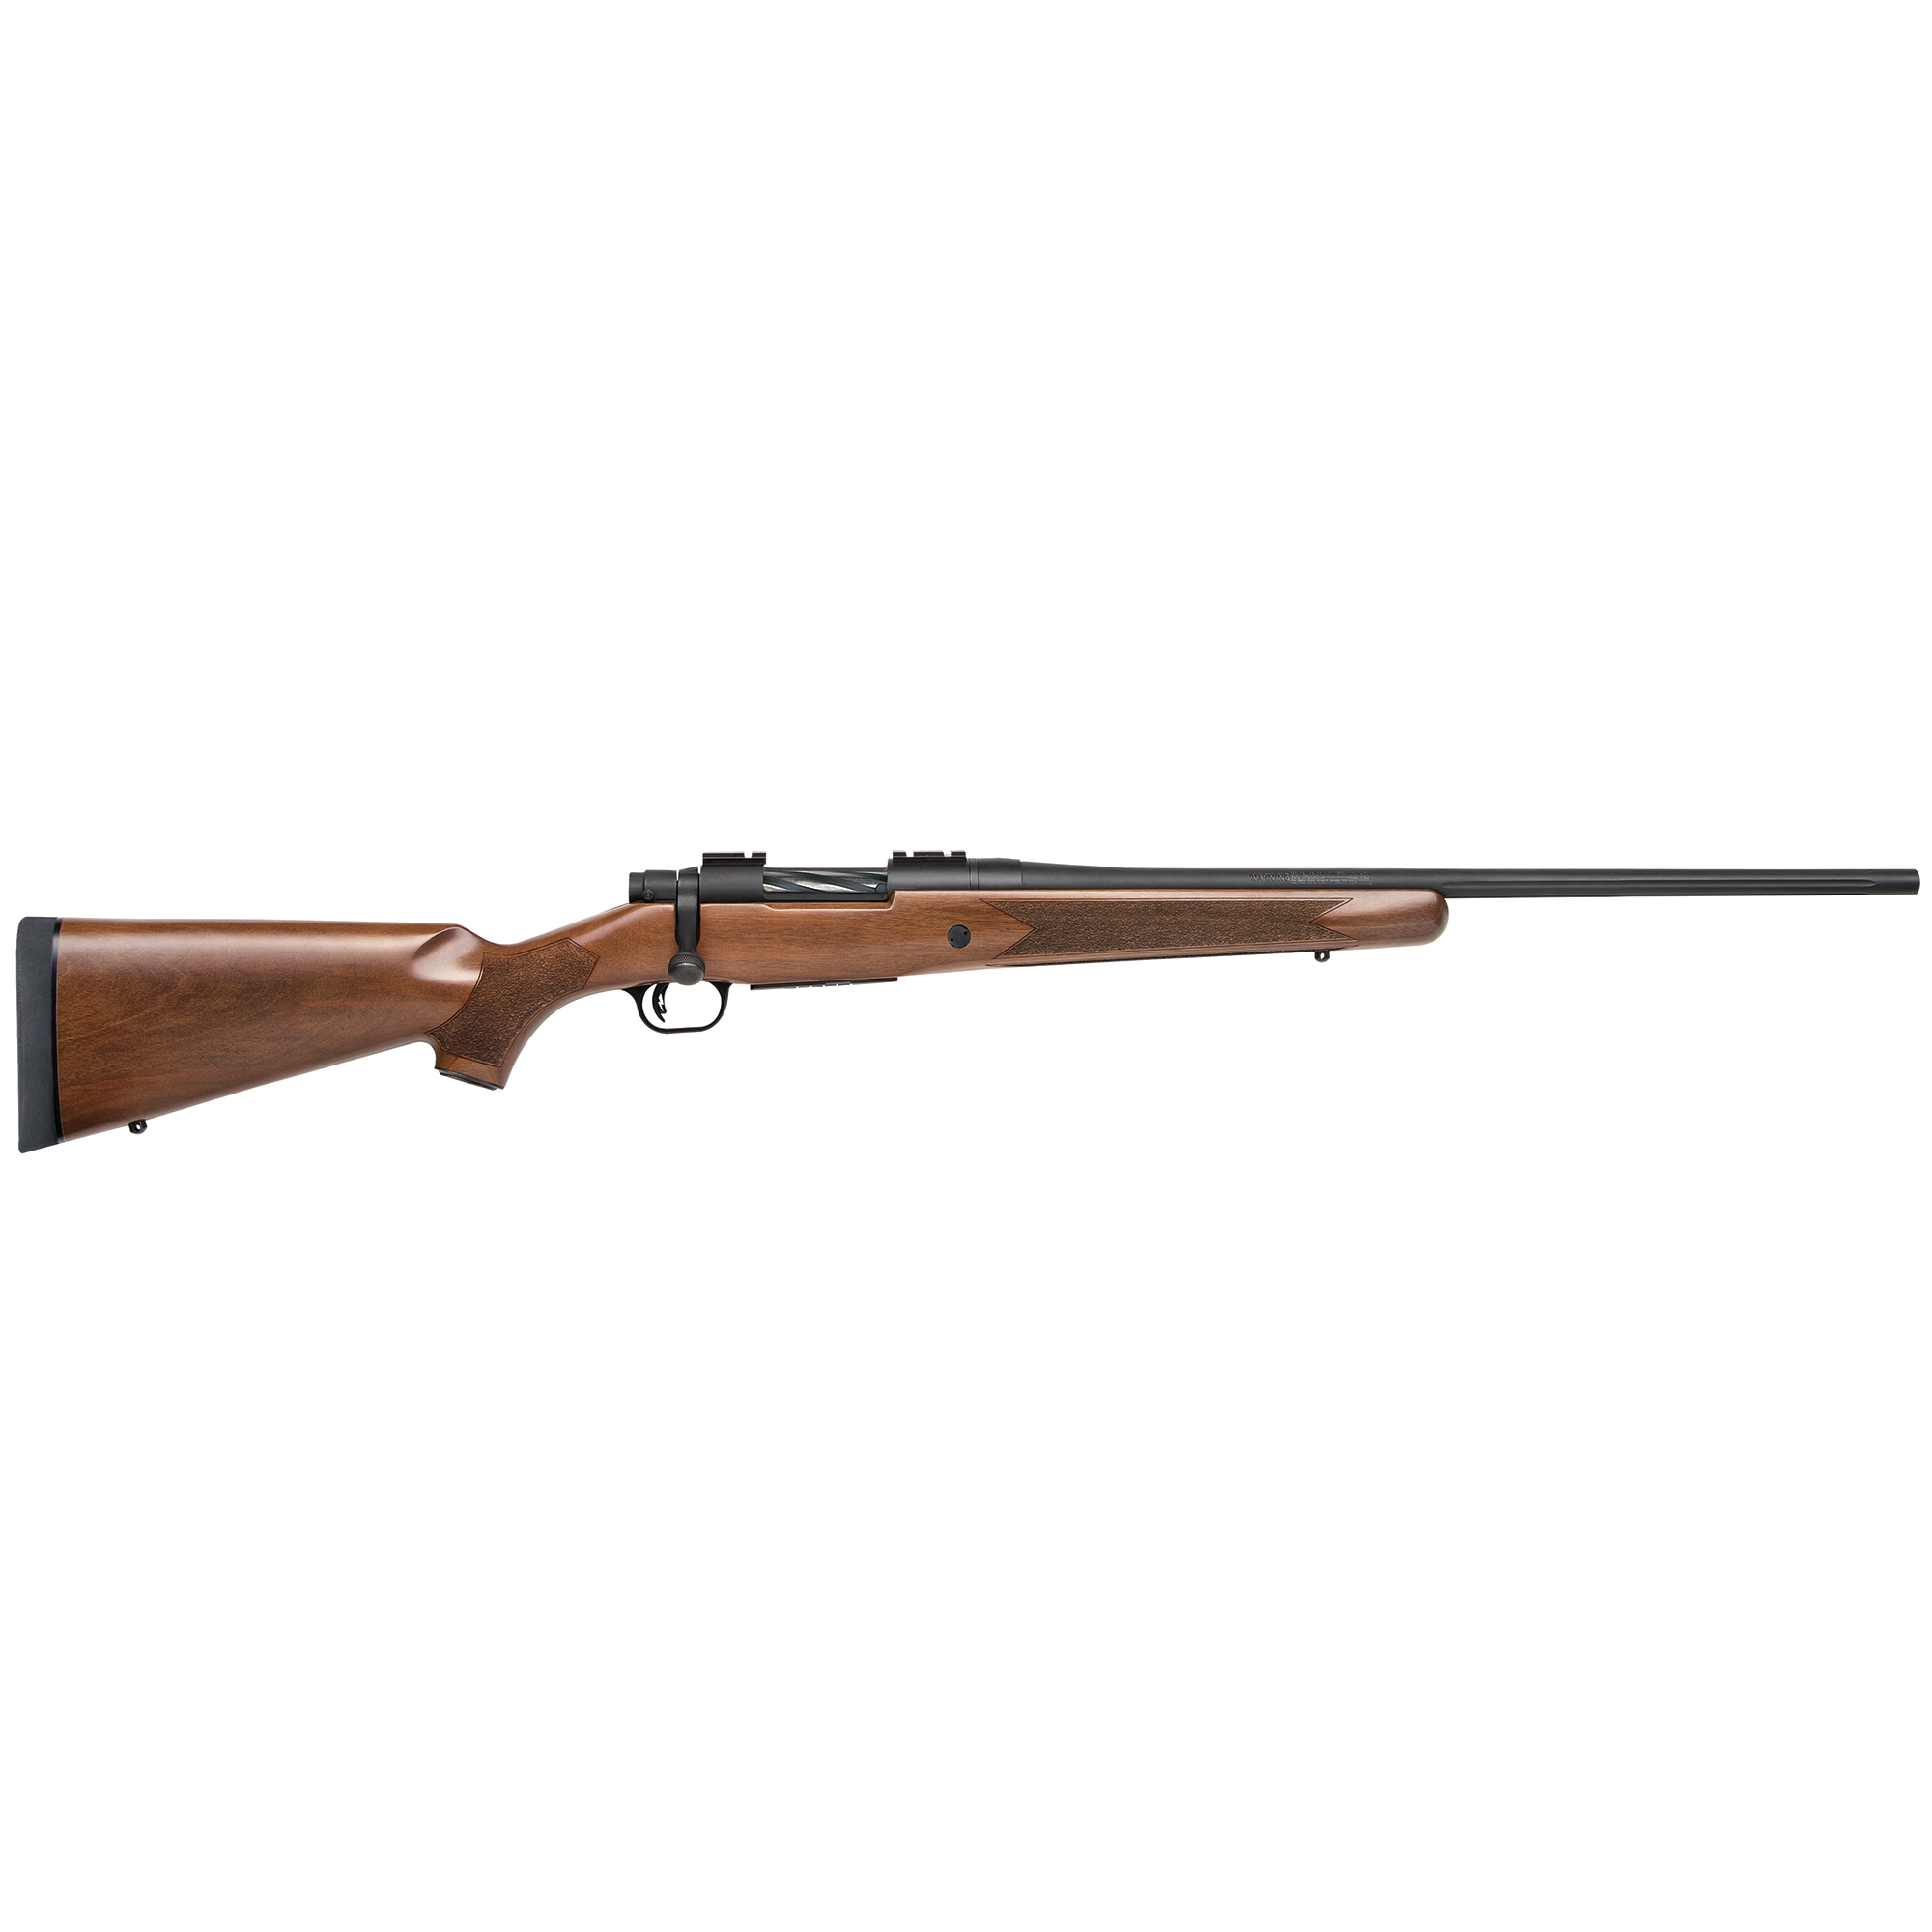 Mossberg Patriot Walnut Centerfire Rifle, .308 Win.